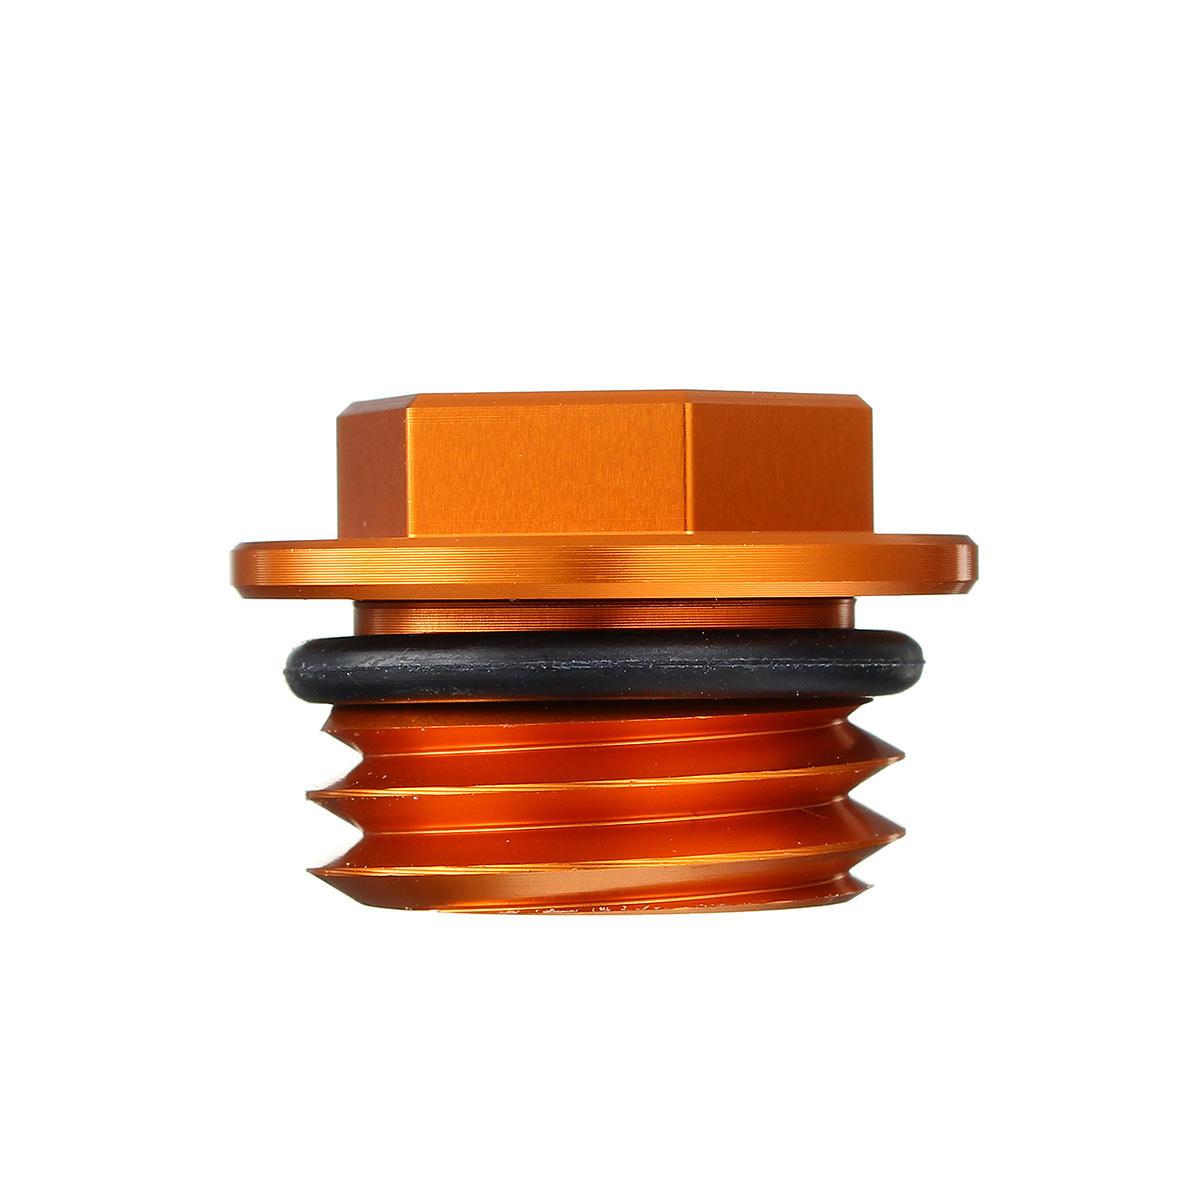 Oiling Plug Scerw Cap CNC Rostfritt Stål Orange För KTM 125-530 SX / SX-F / EXC / EXC-F